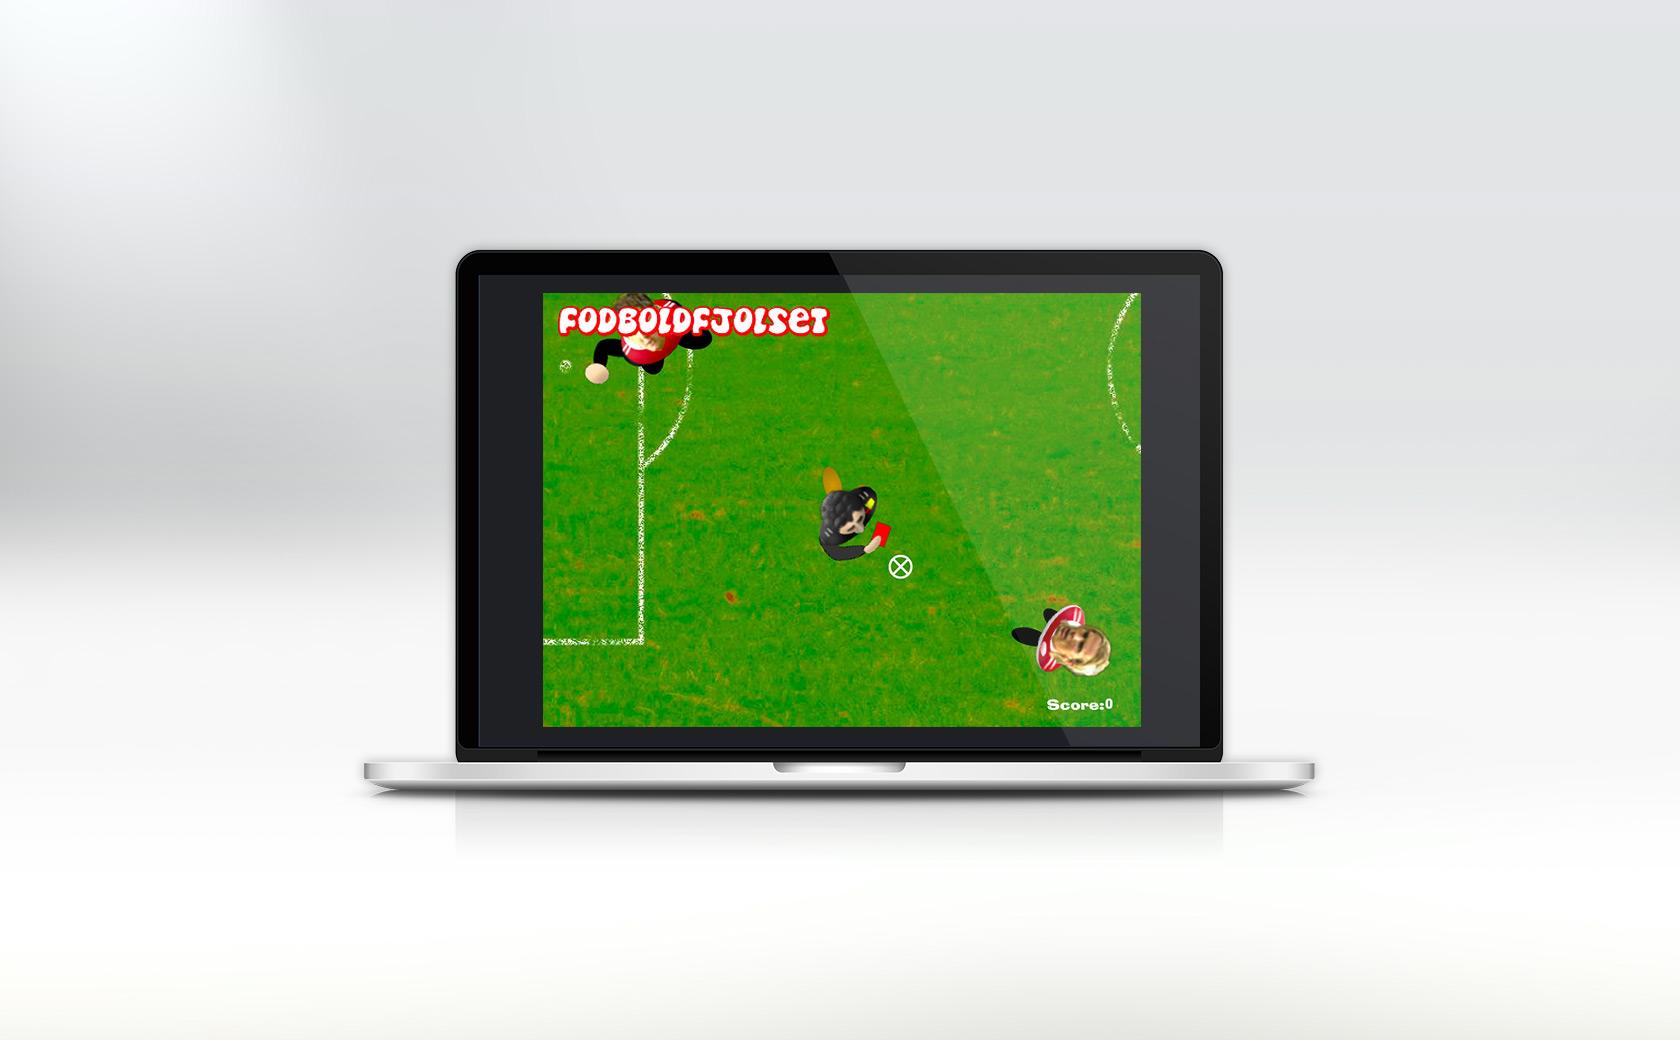 Fodboldfjolset